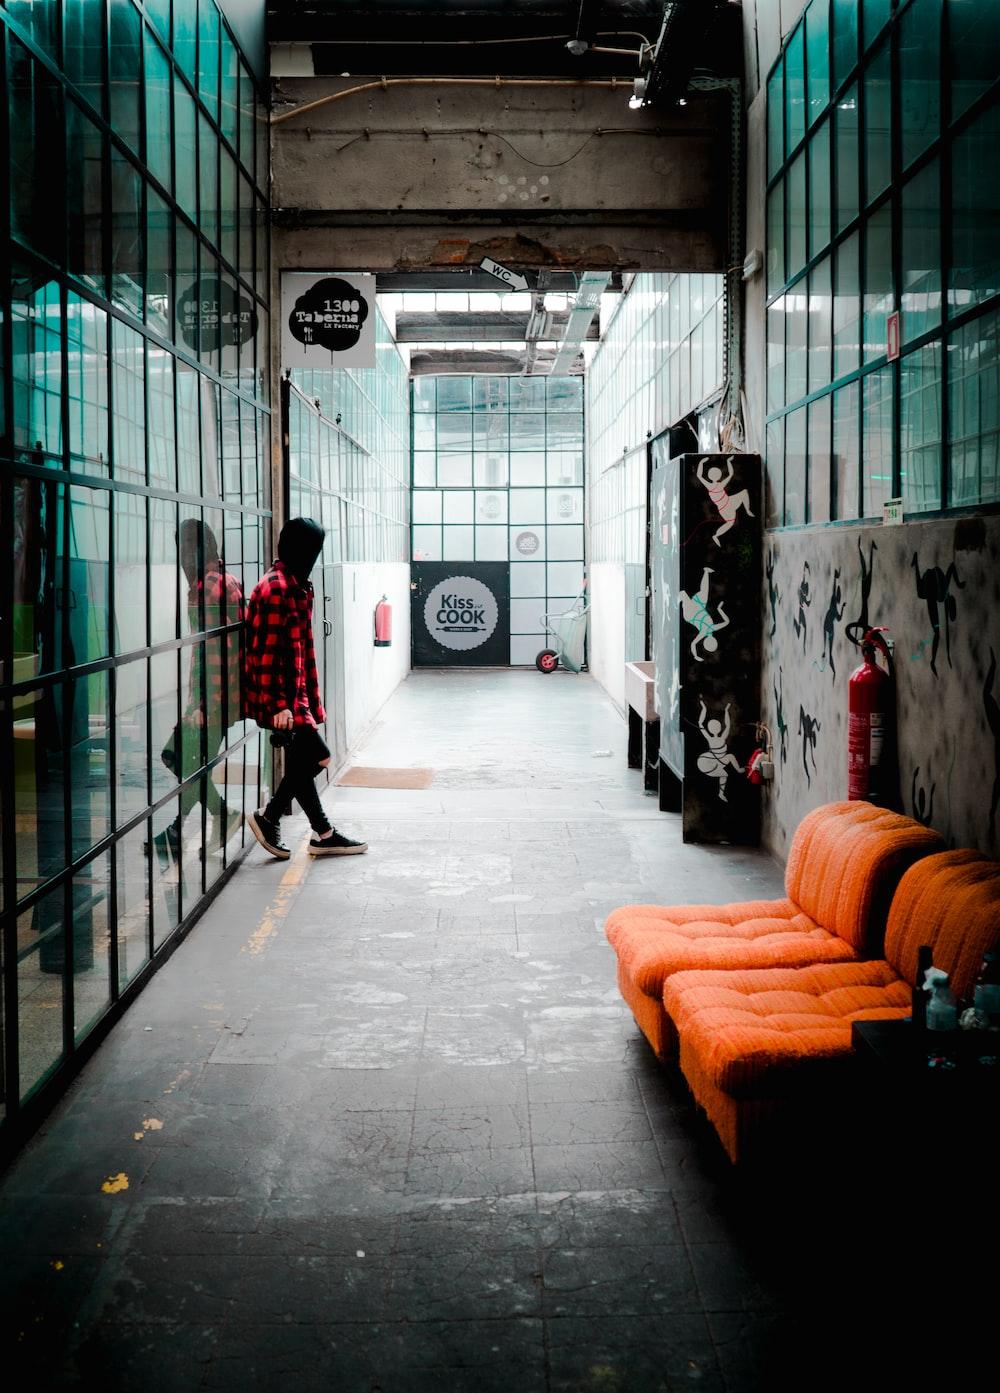 person standing near tufted orange sofa